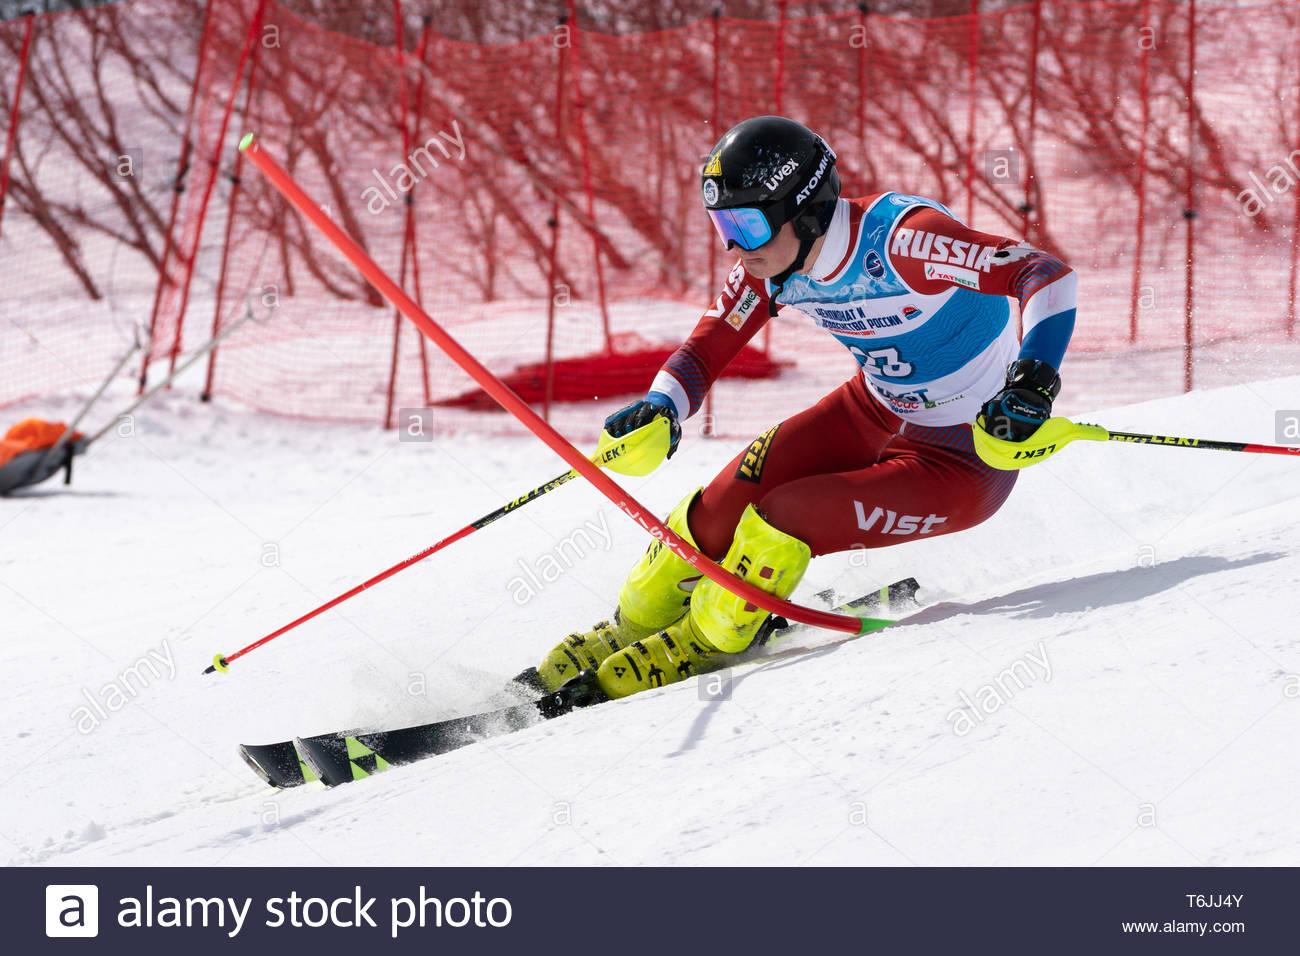 MOROZNAYA MOUNT, KAMCHATKA, RUSSIA - MARCH 29, 2019: Russian Alpine Skiing Championship, International Ski Federation Championship, slalom. Mountain s - Stock Image